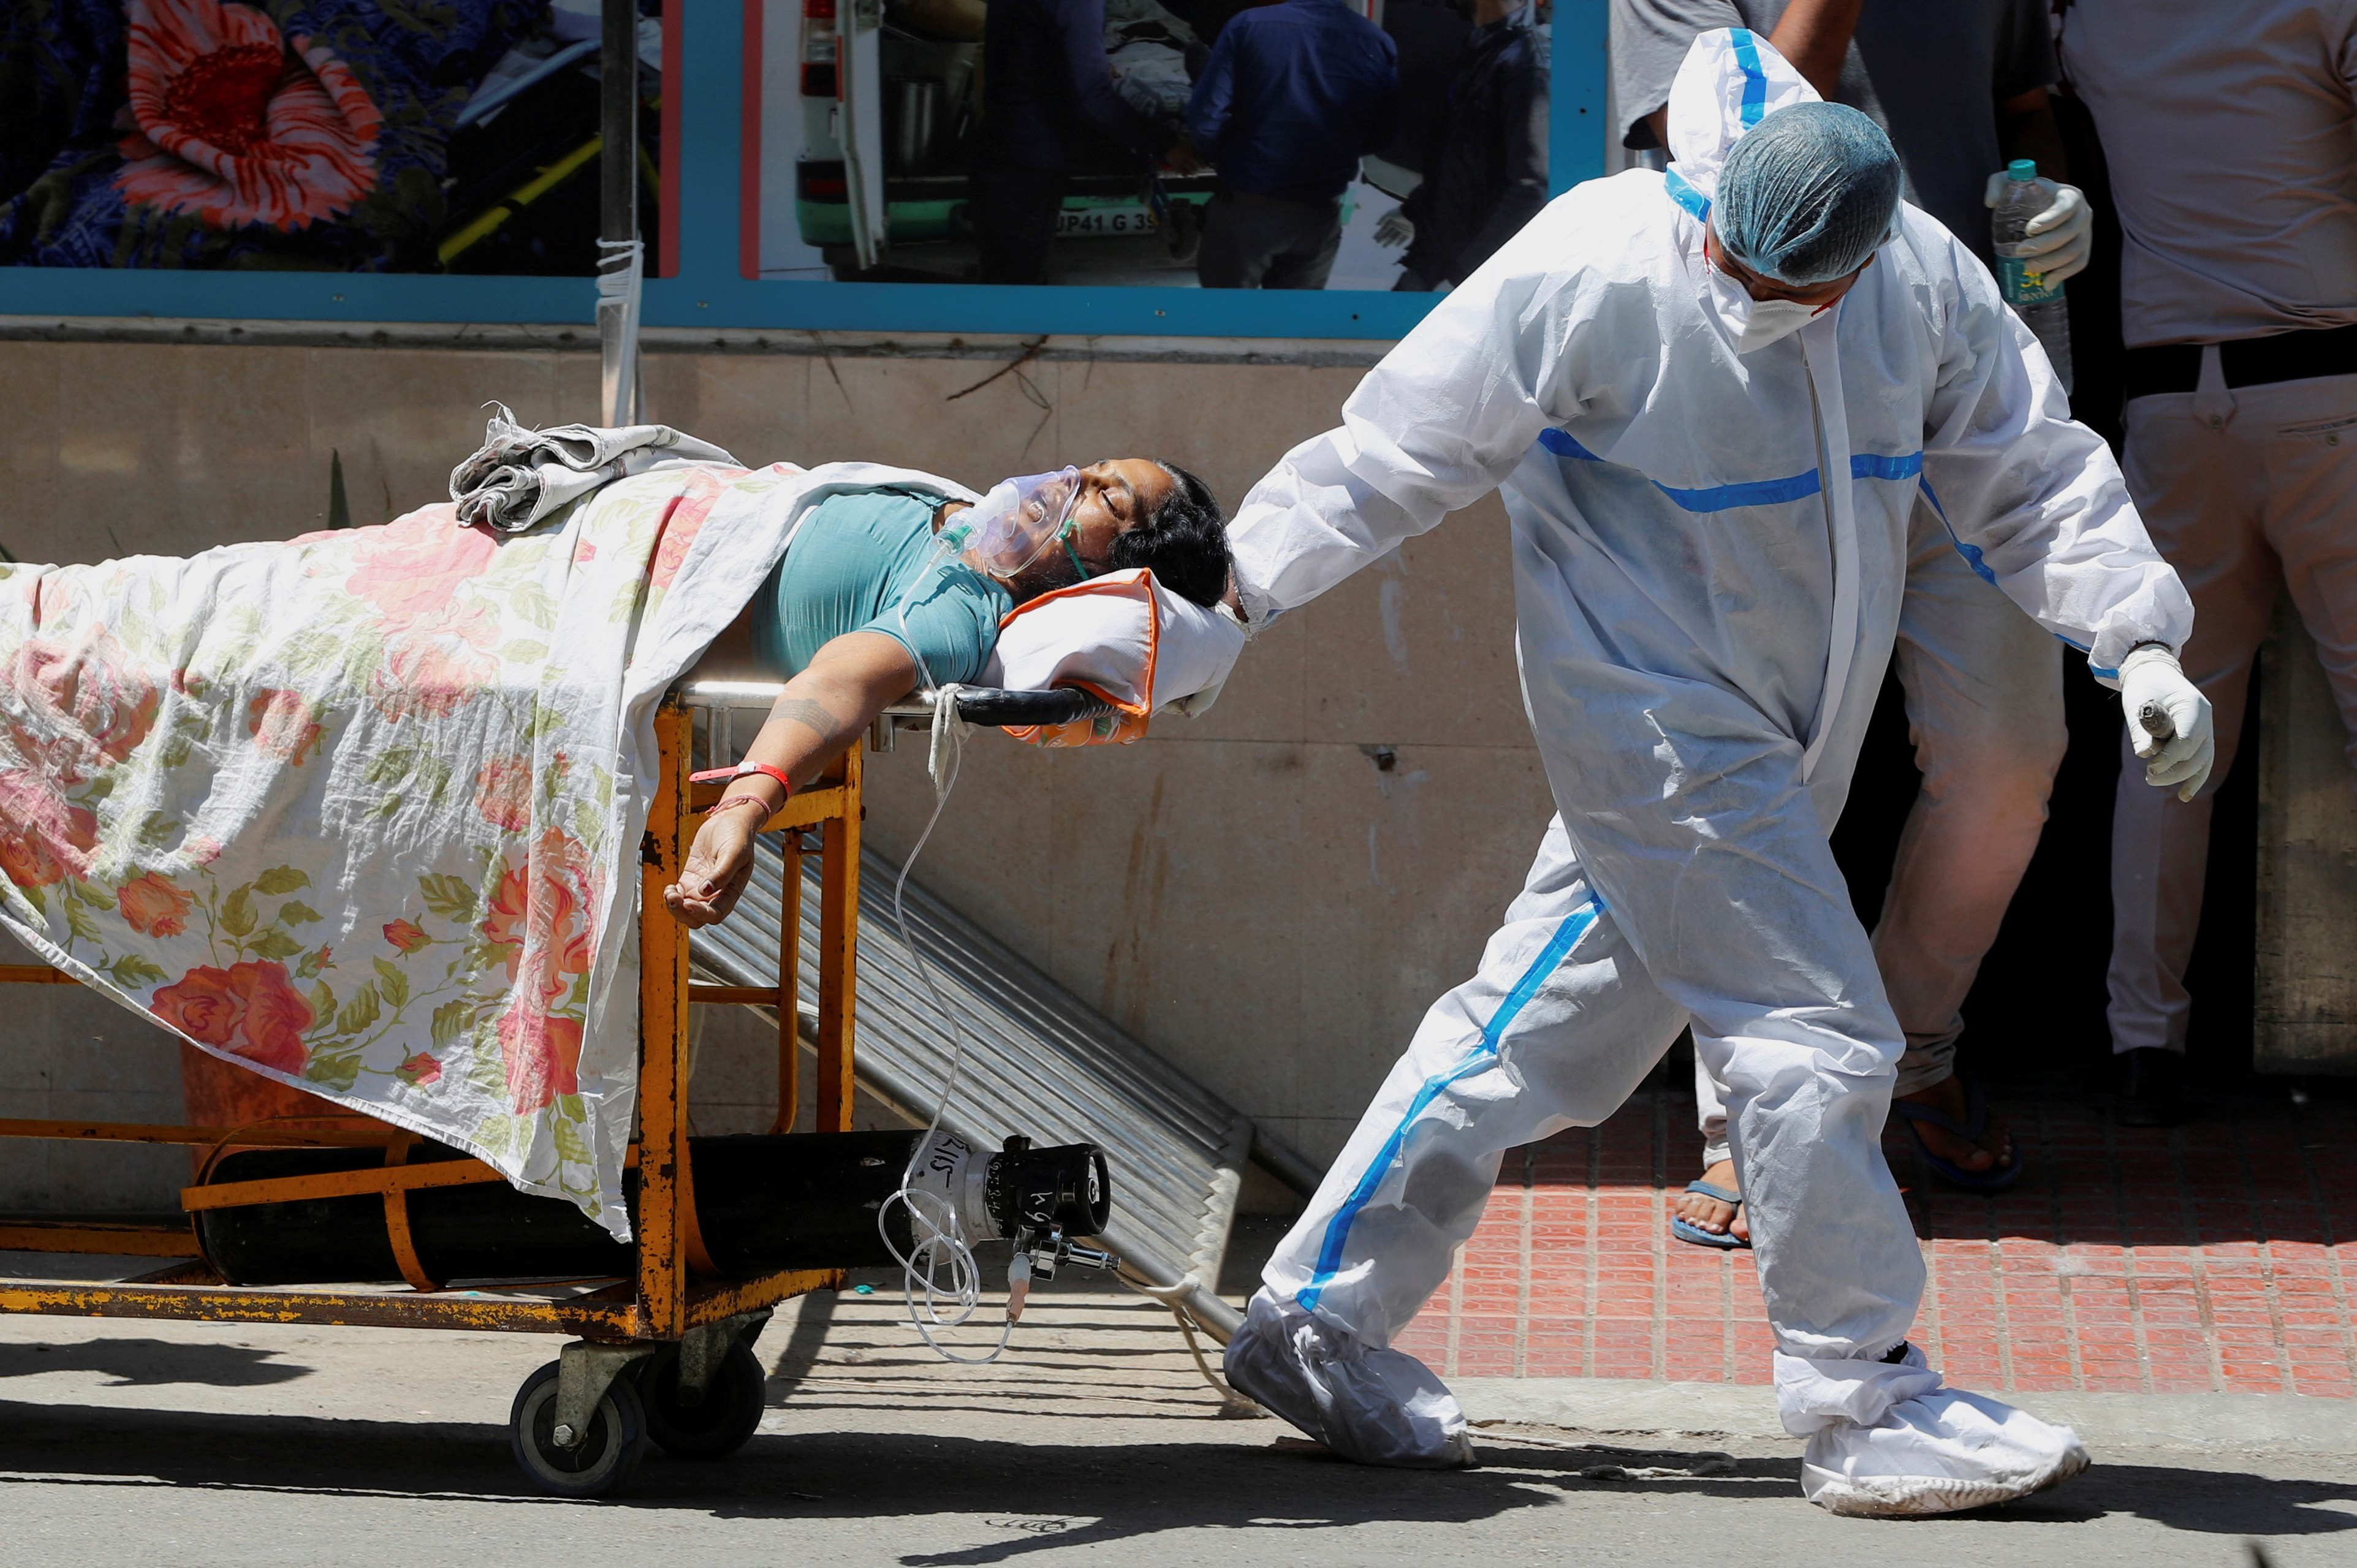 Revista científica critica resposta da Índia ao enfrentamento da pandemia